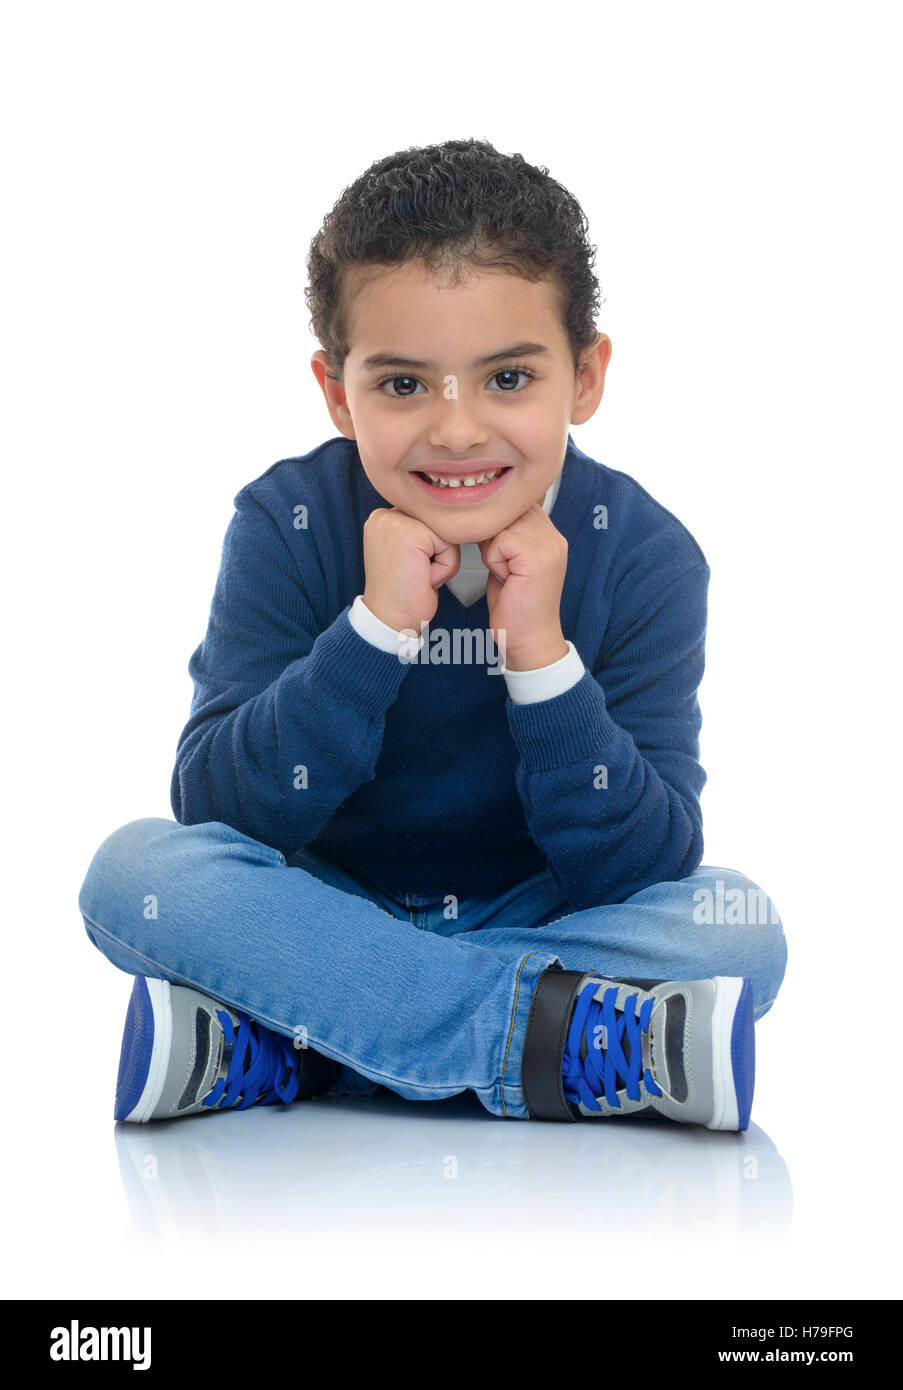 Cute Happy Boy Sitting Isolated on White Background - Stock Image